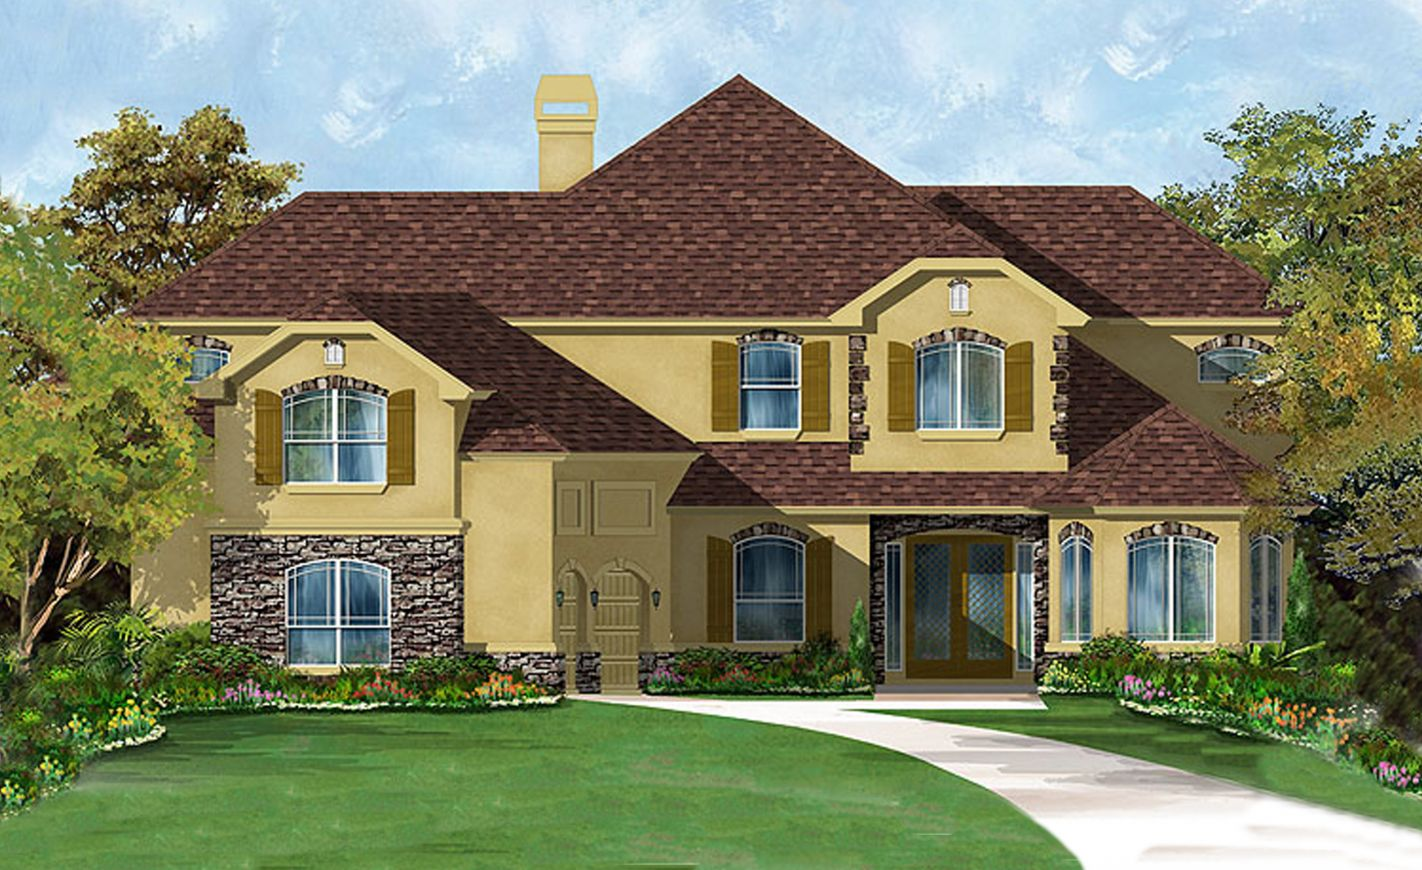 New Homes for Sale in Jacksonville FL  - The Nottingham II at Tamaya